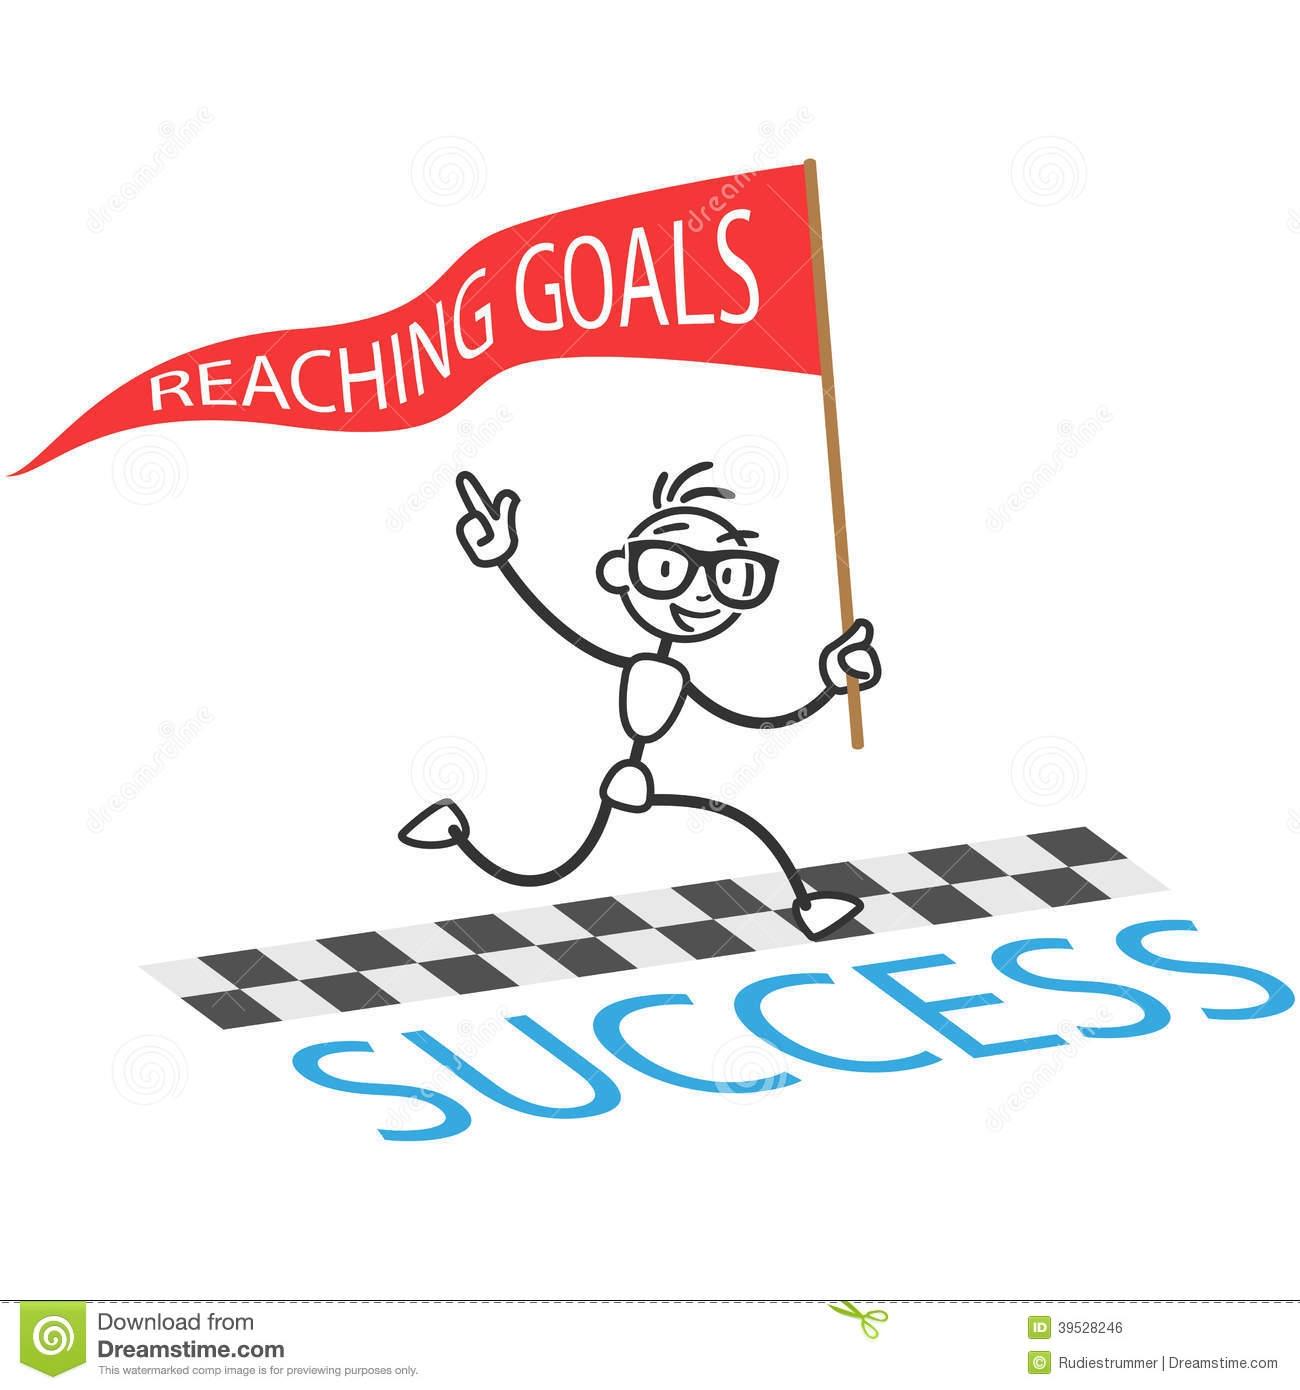 2018 clipart goal. New goals collection digital